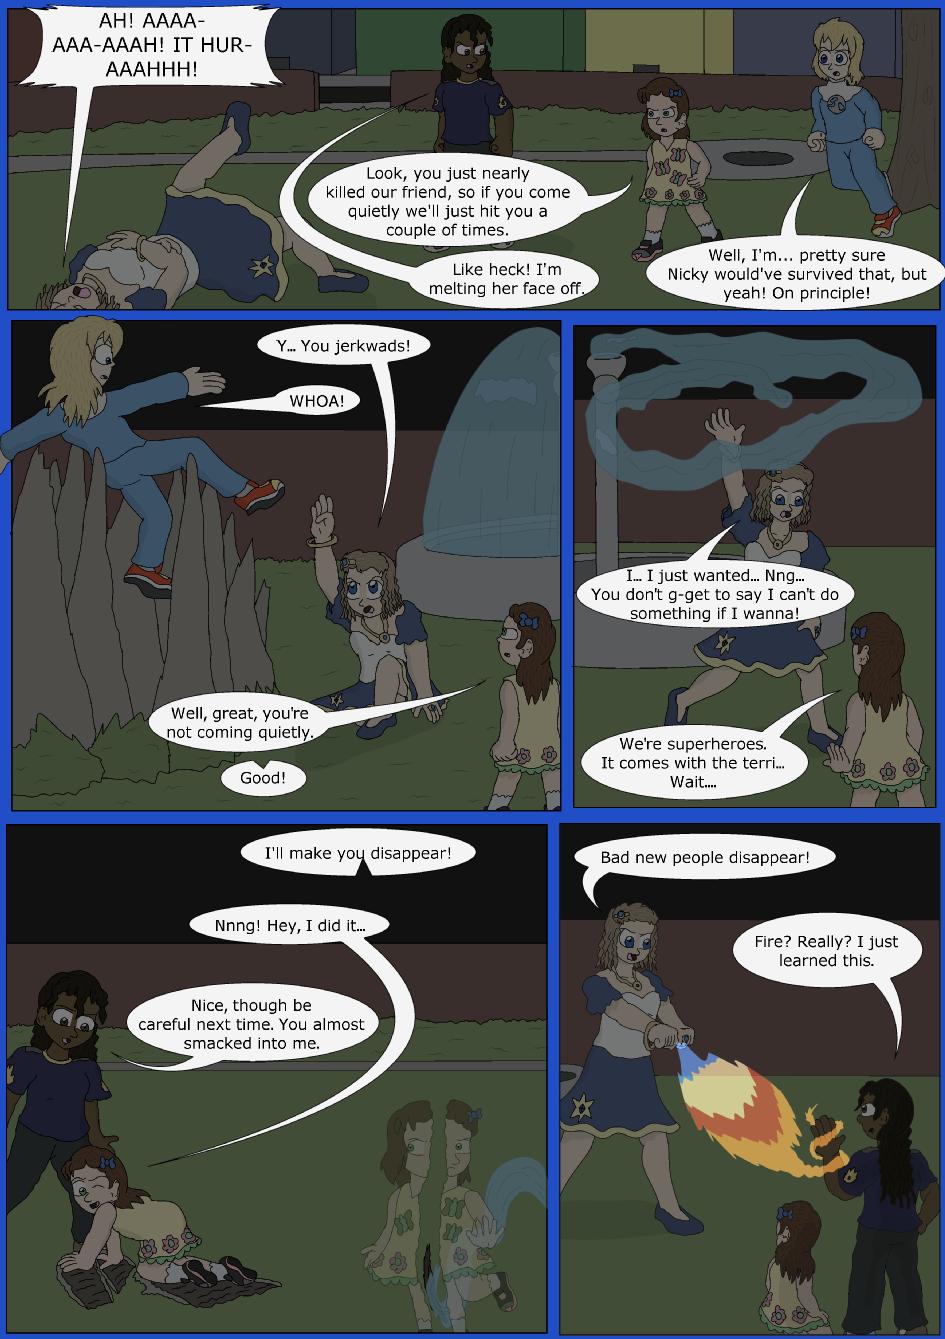 Stronger, Faster, Bluer, Page 16er